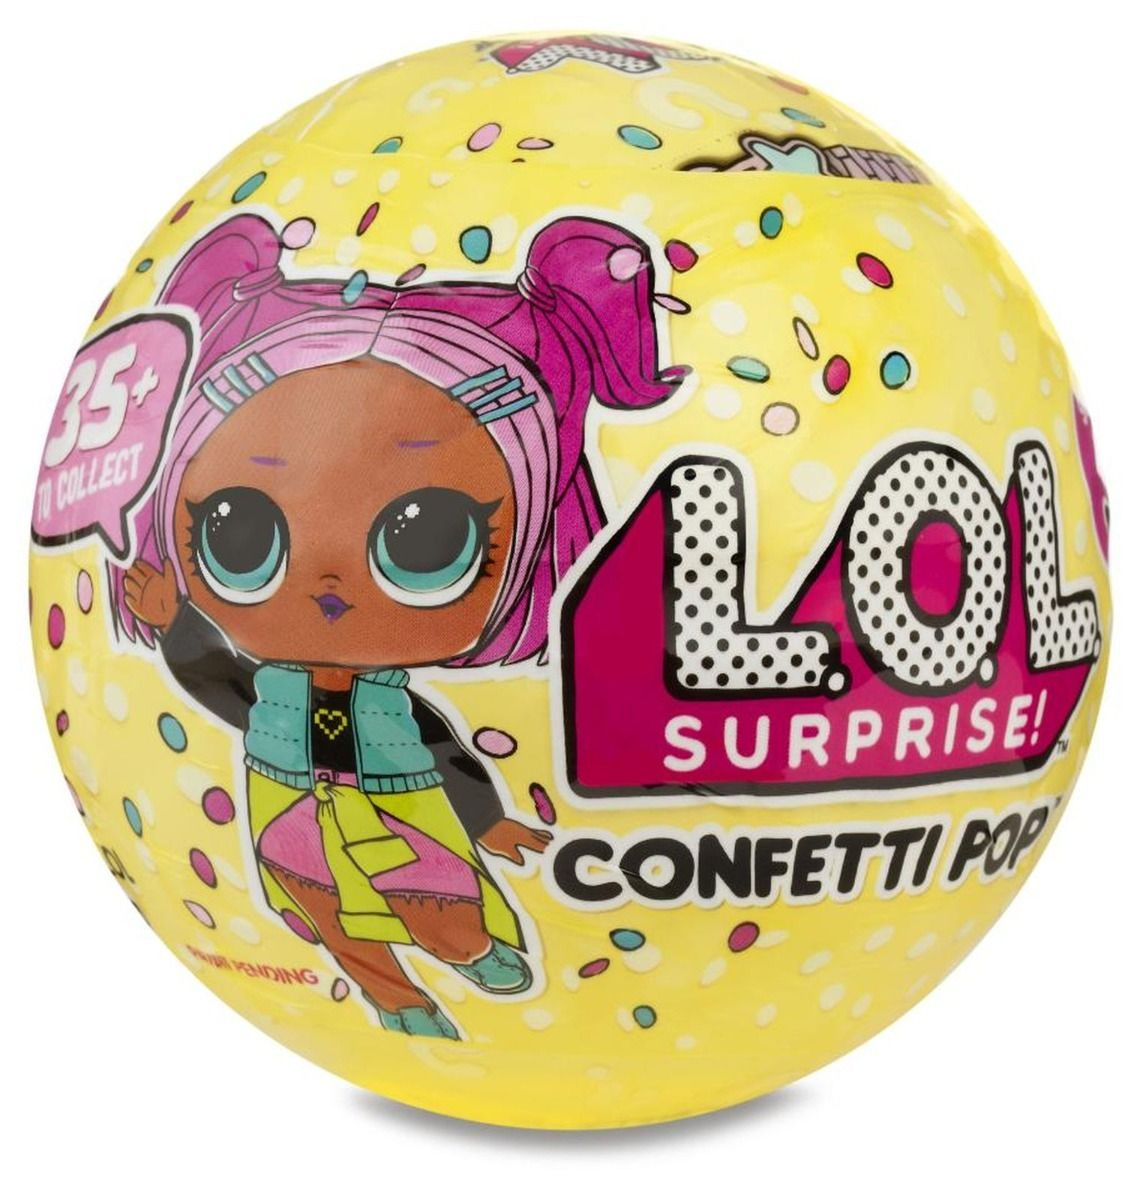 Boneca L.O.L  LoL Confetti Pop Surprise Serie 3 – 9 surpresas  Candide  - Doce Diversão